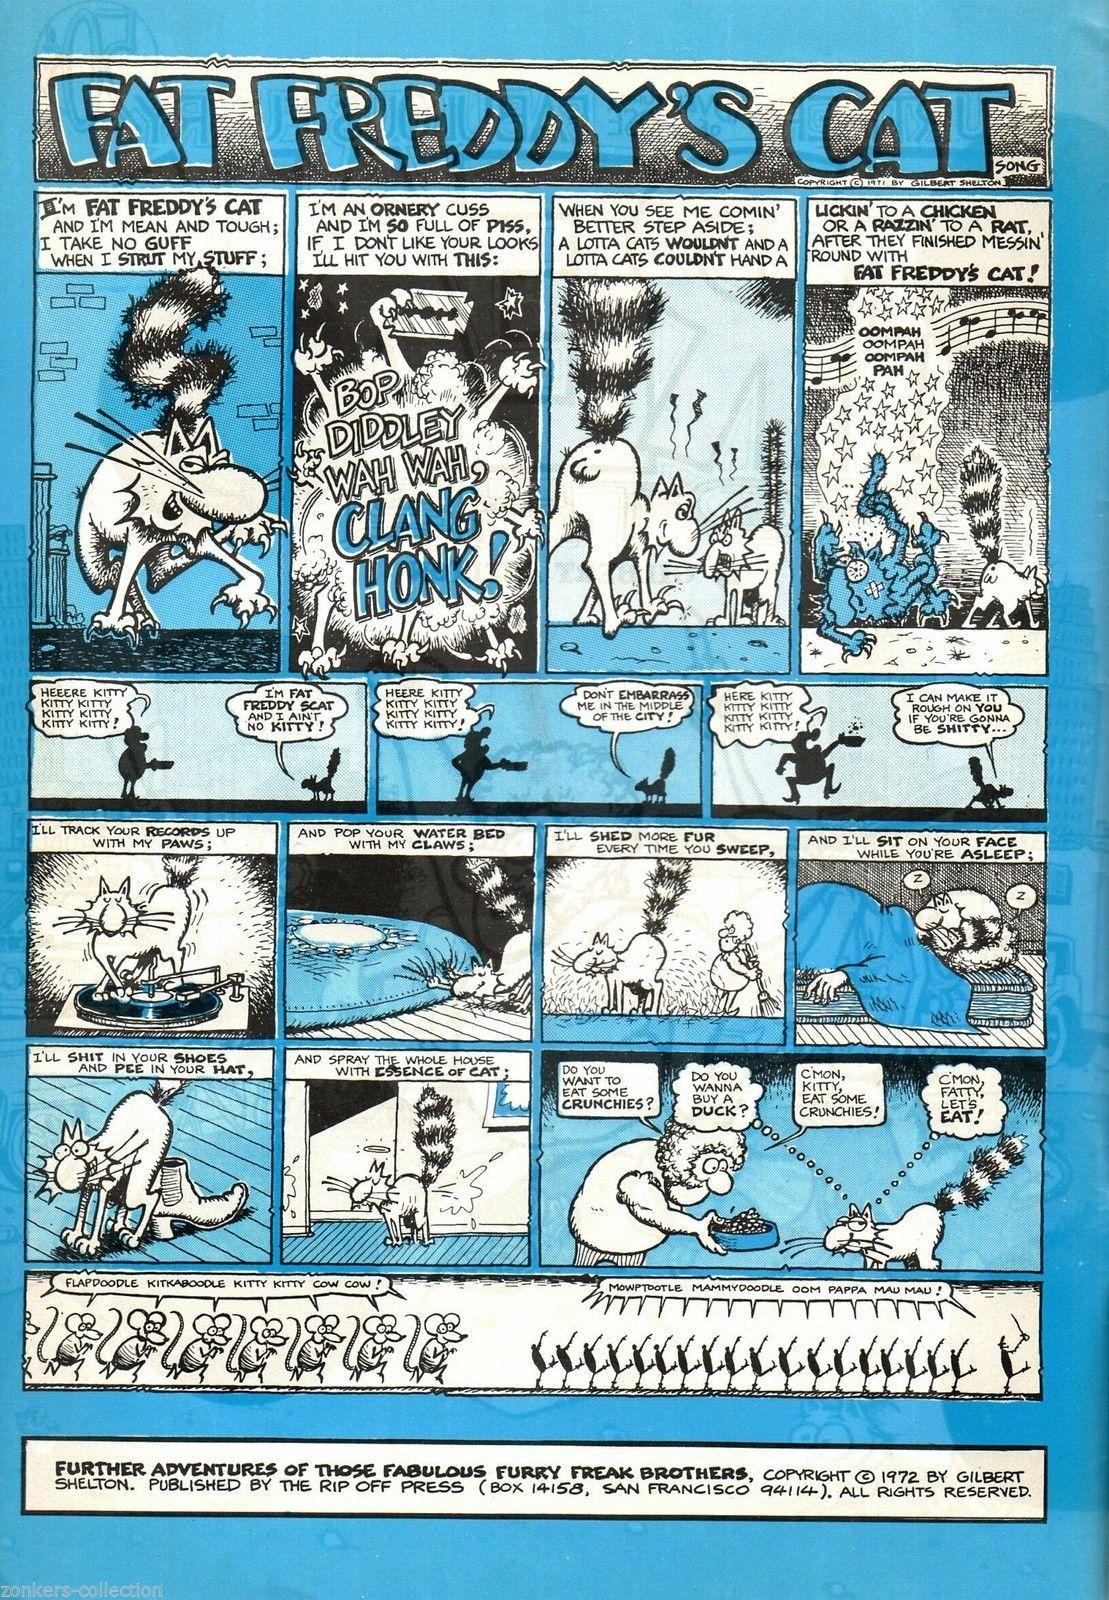 Freak Brothers 2 Rip Off Press 3rd print 1972 Gilbert Shelton